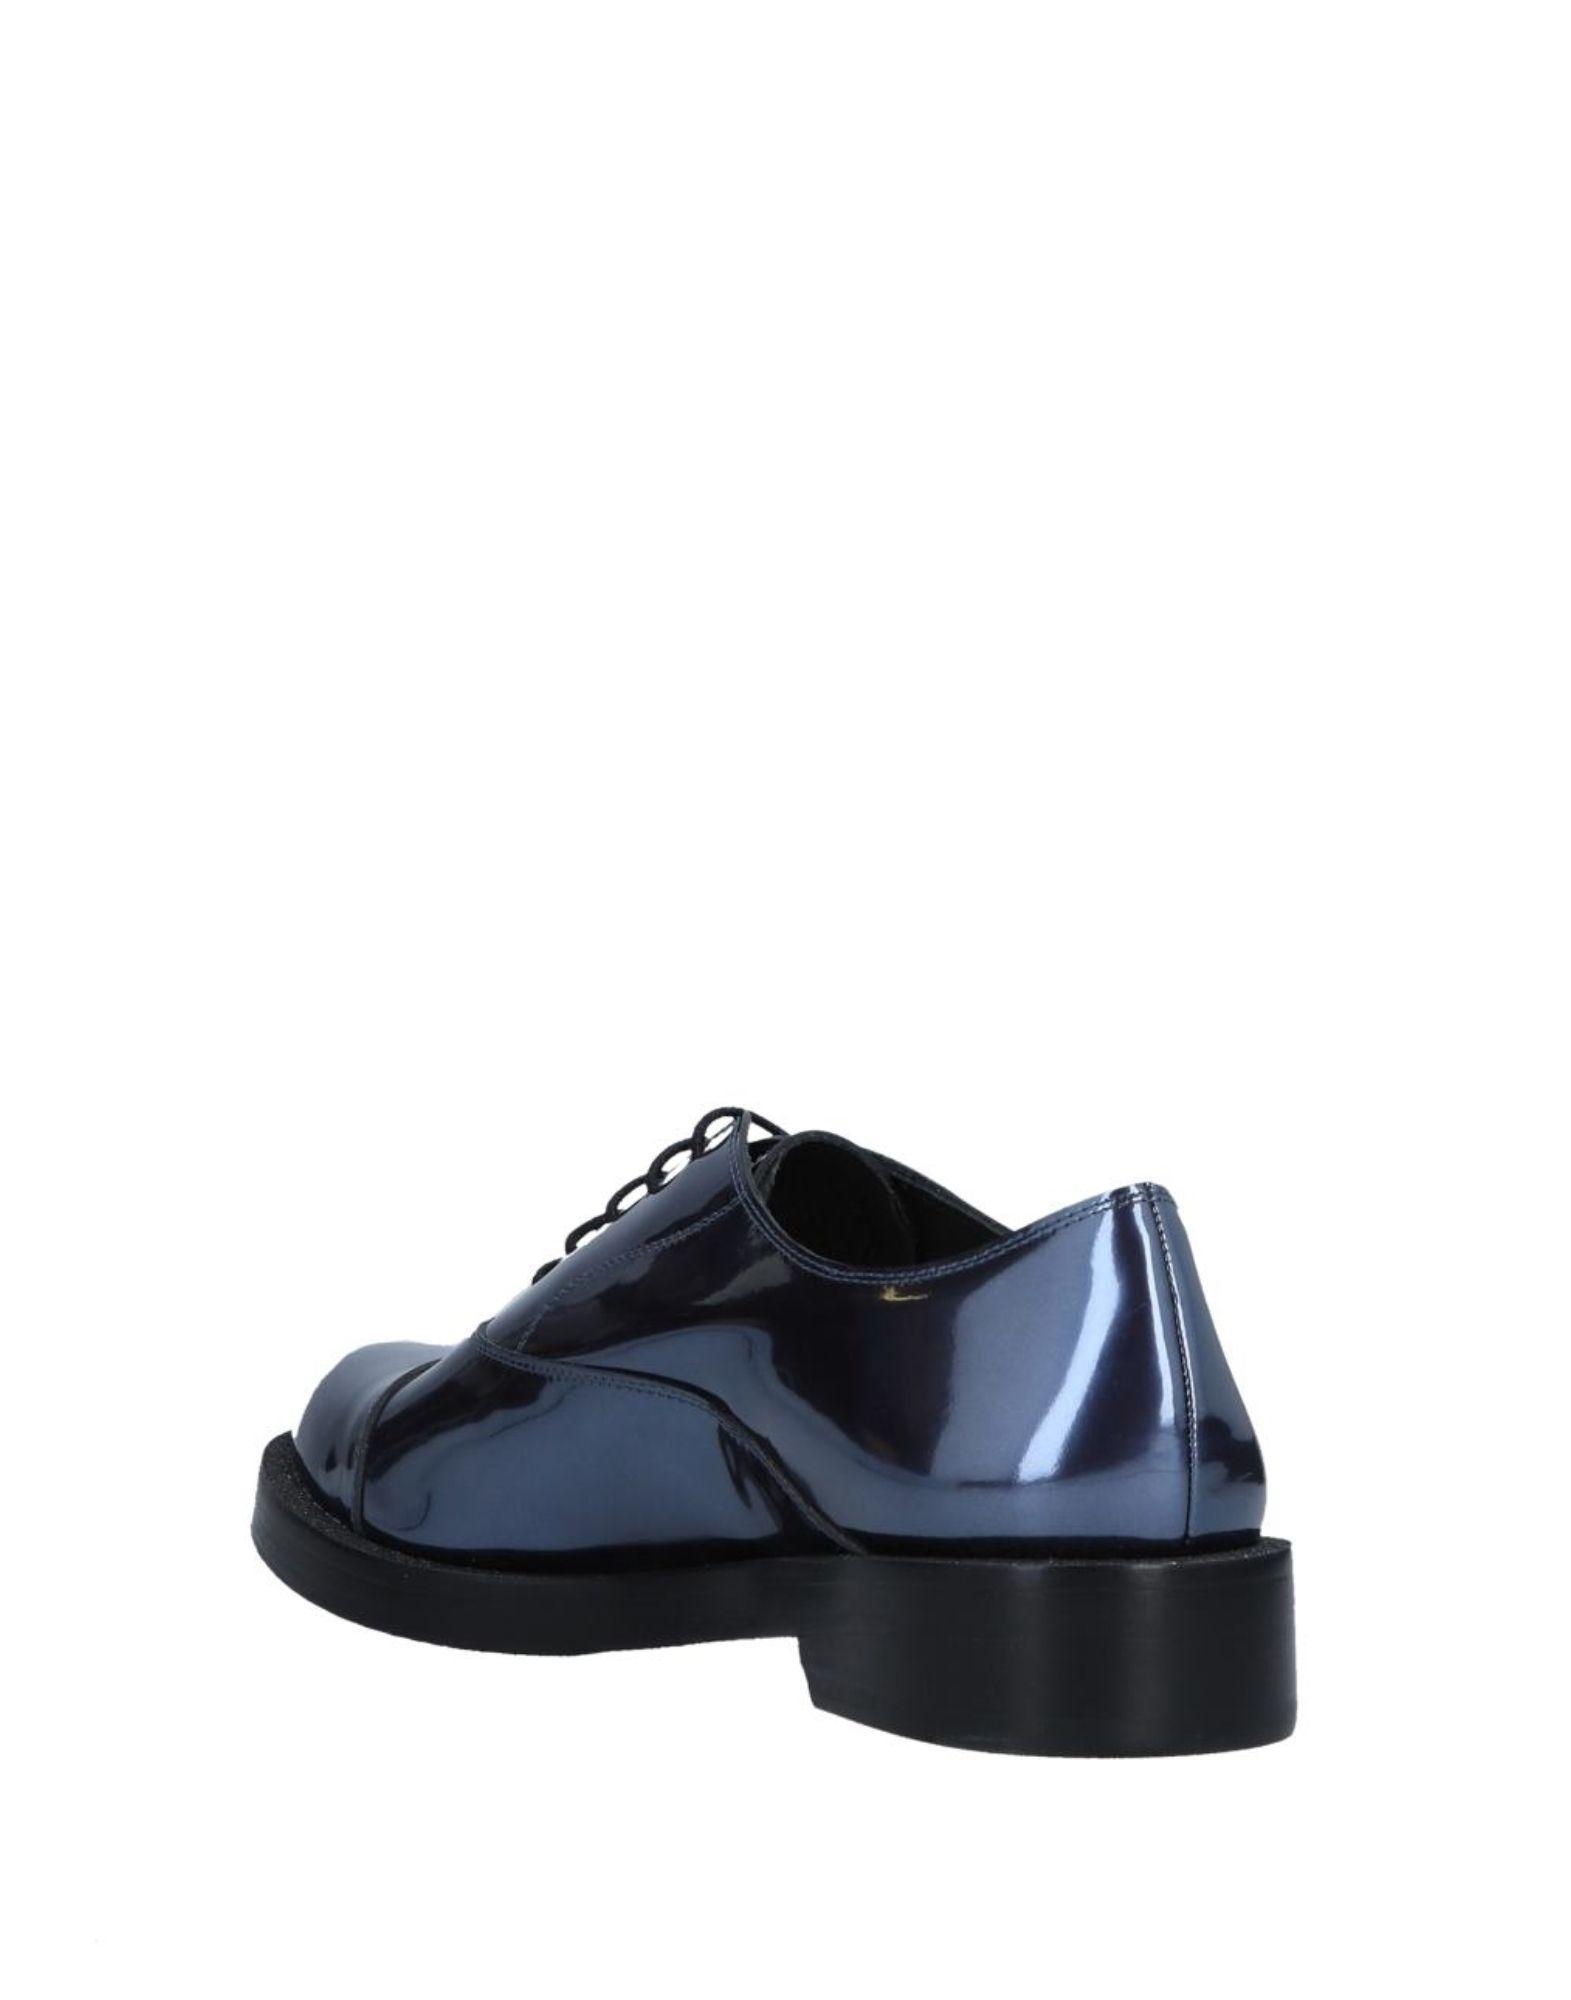 Stilvolle billige Schuhe Damen Pedro García Schnürschuhe Damen Schuhe  11528411HR 7b2926